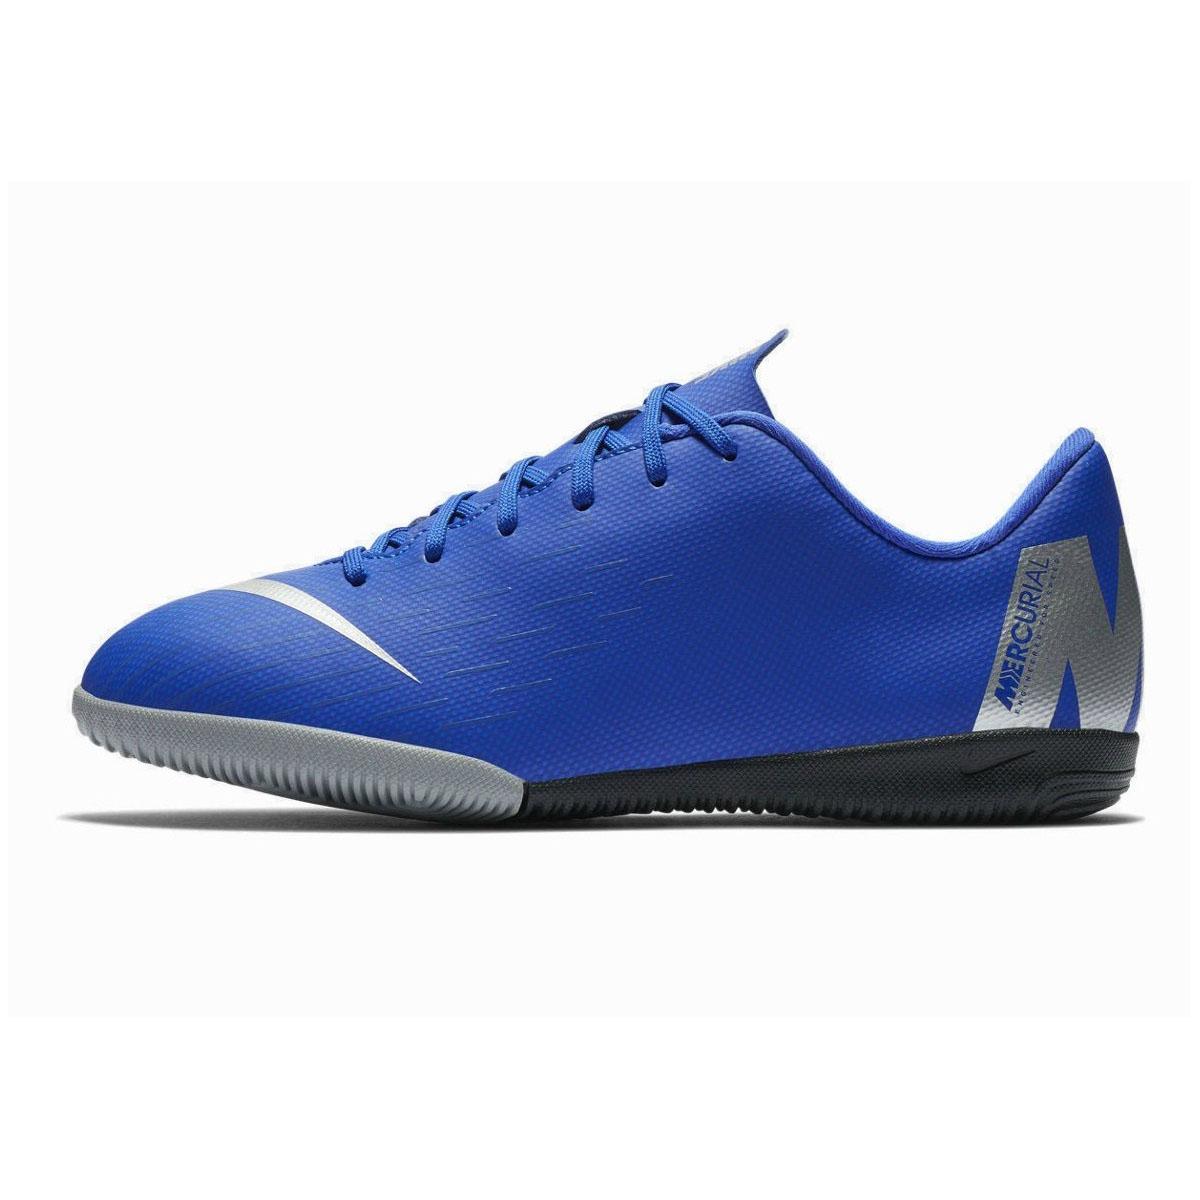 Nike VaporX 12 Academy IC GS (AJ3101-400)